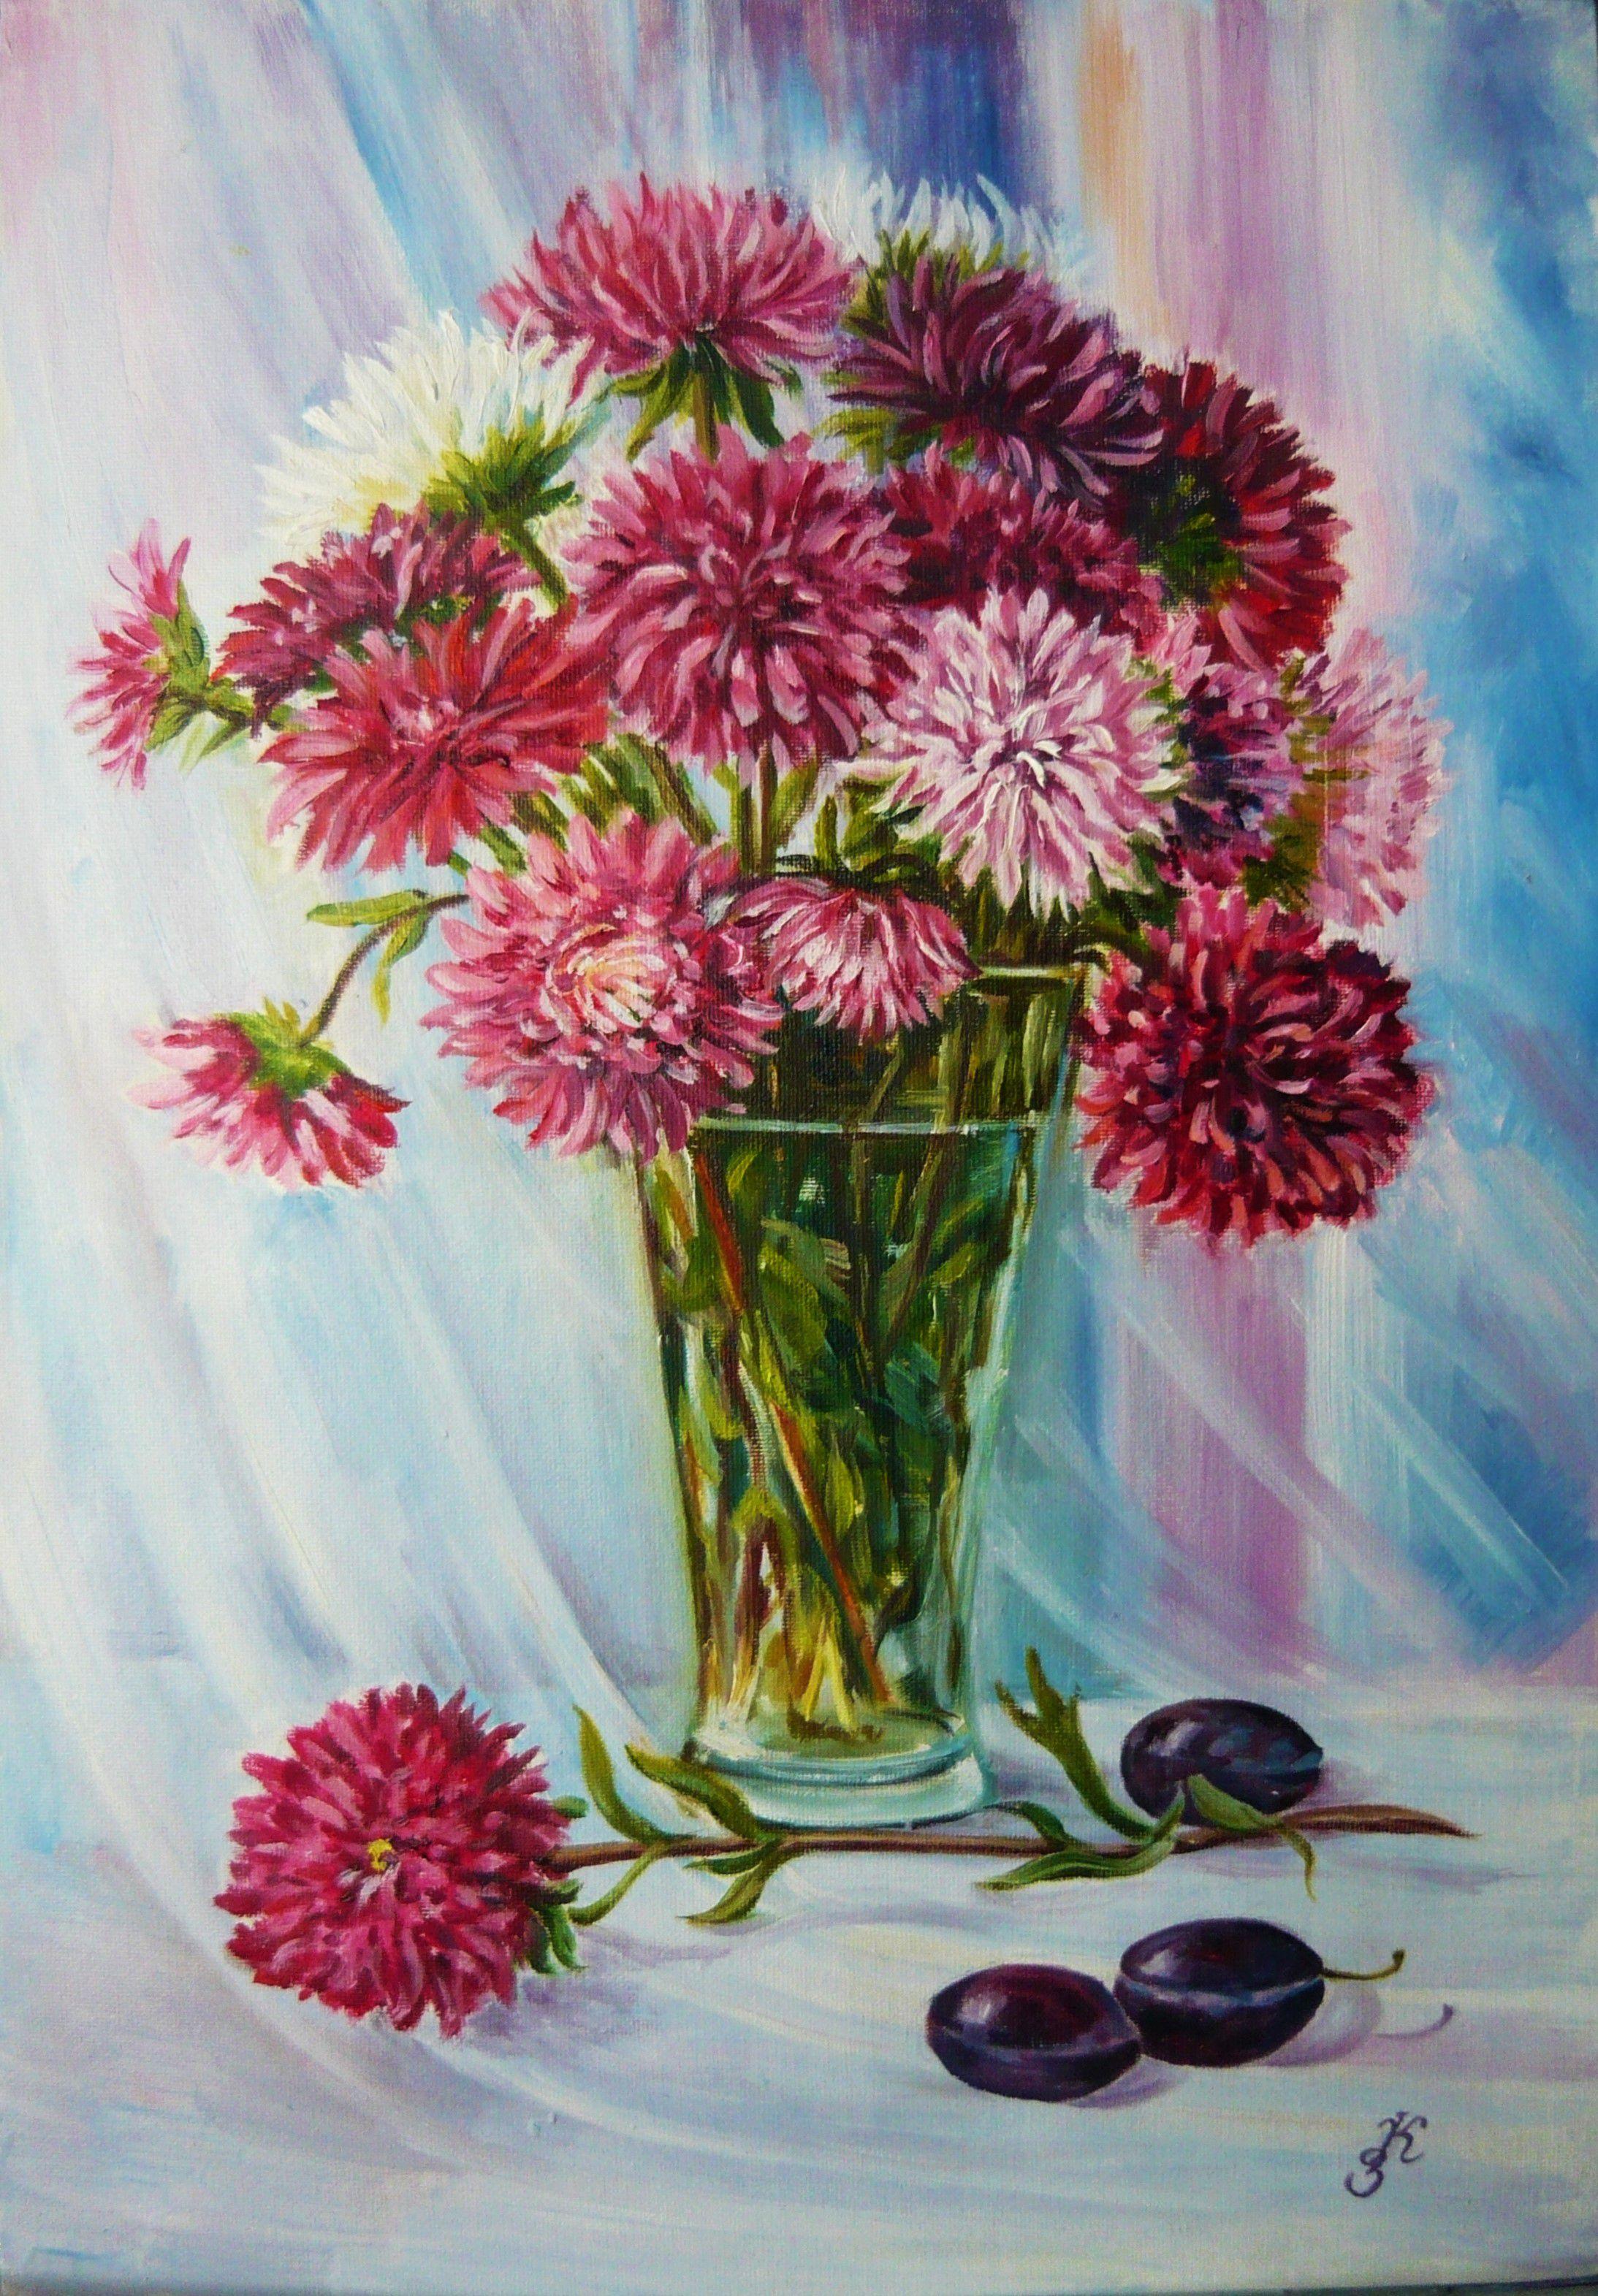 холст масло живопись картины цветы натюрморт